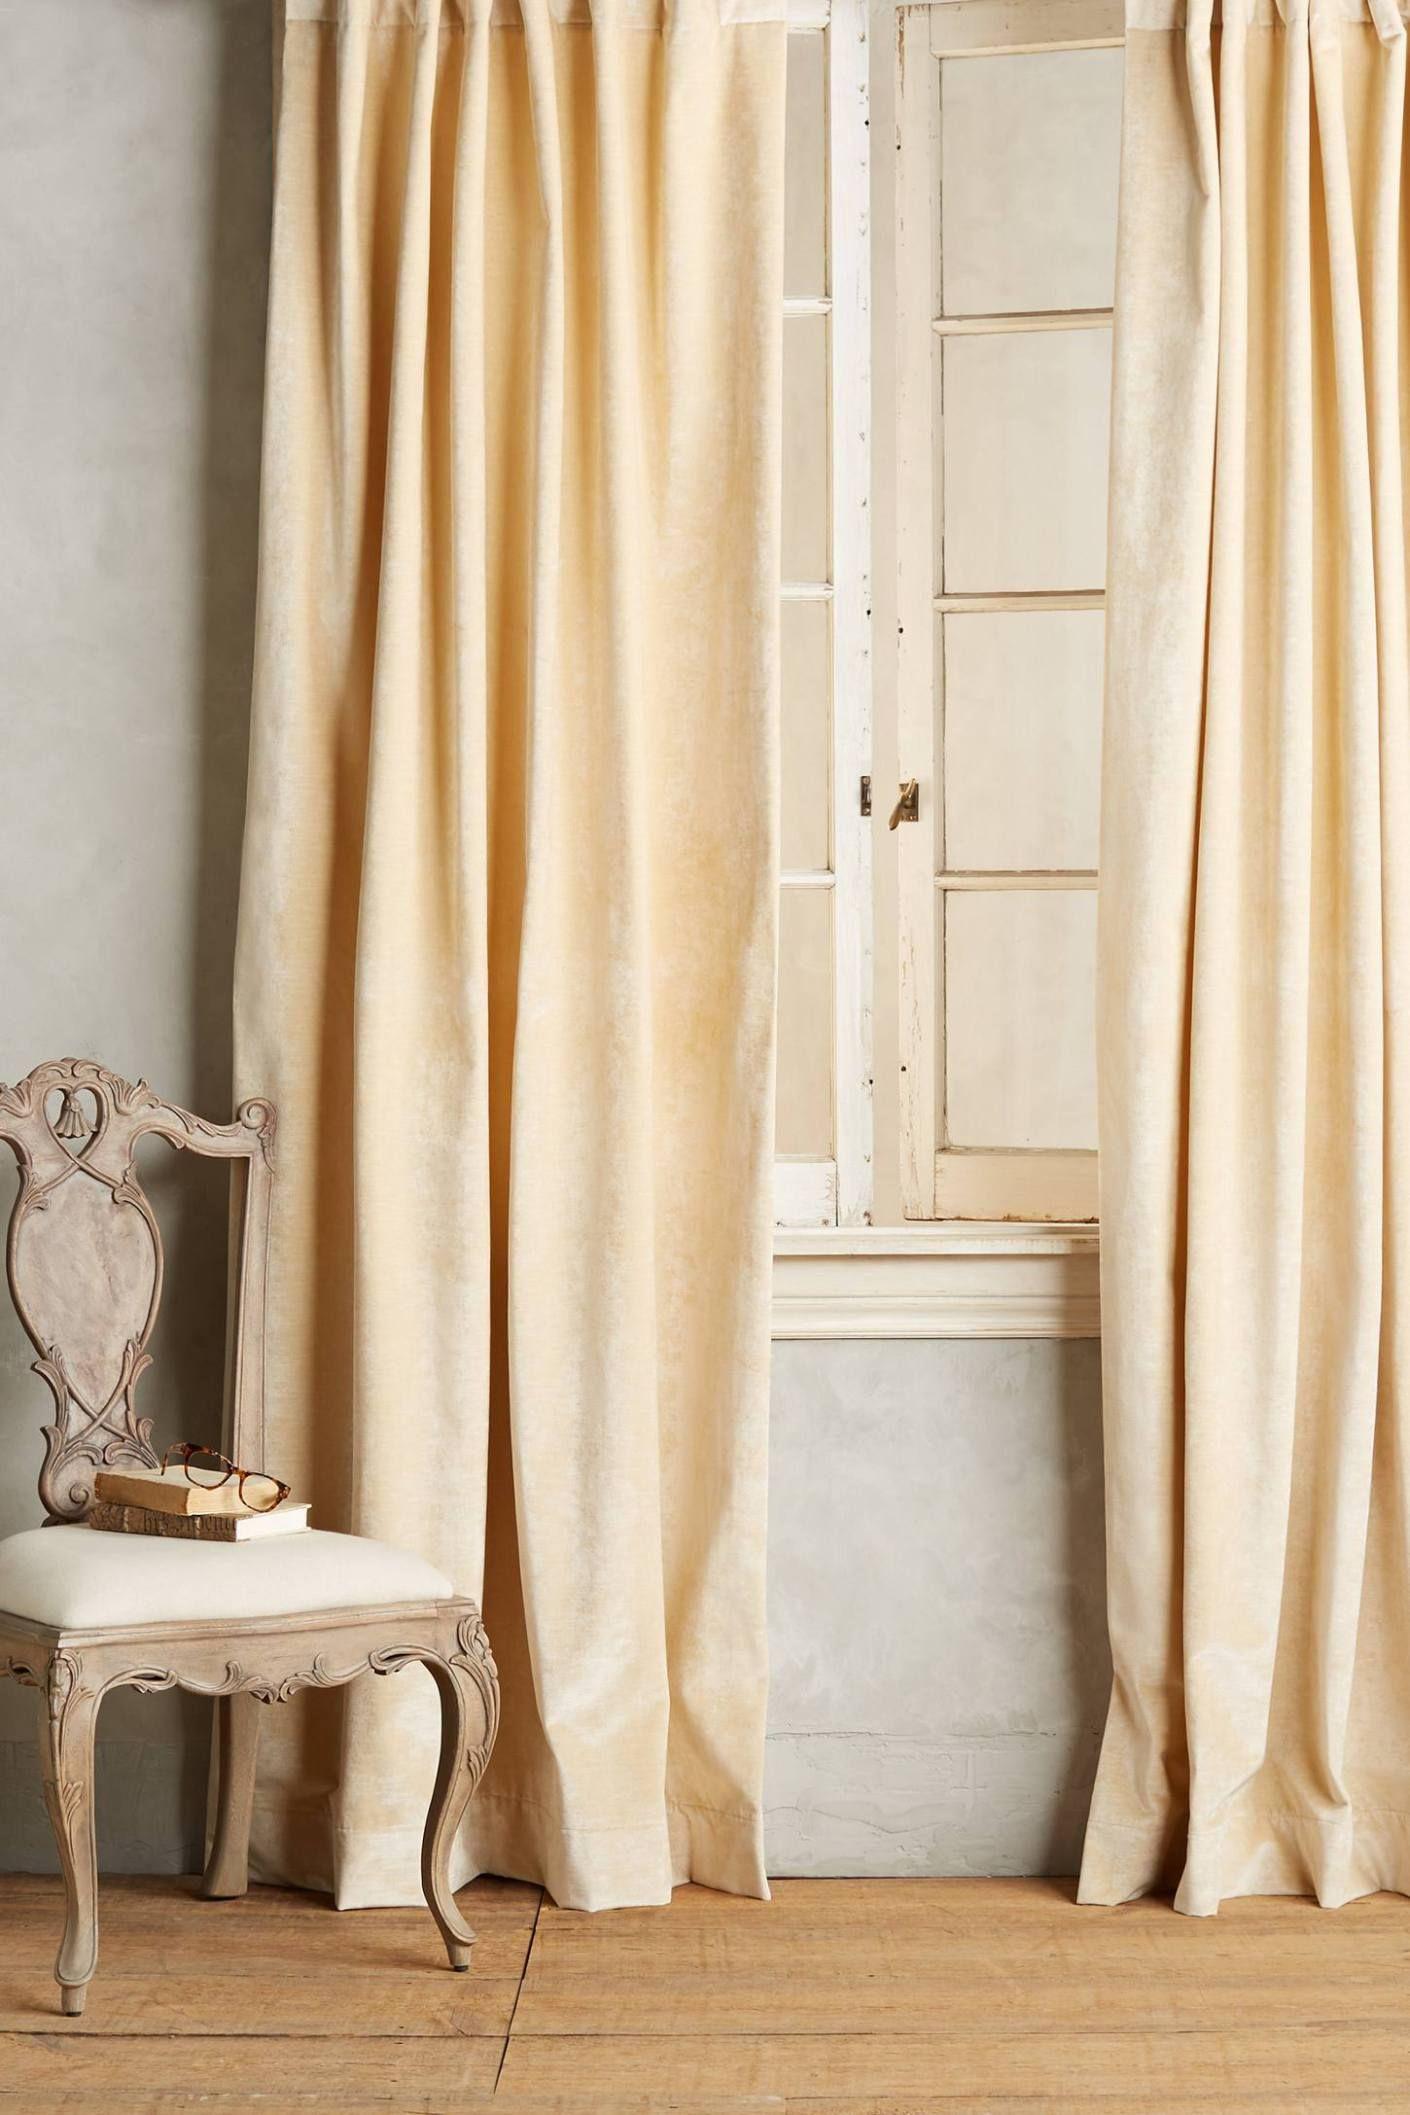 Anthropologies New Arrivals Velvet Curtains  Topista